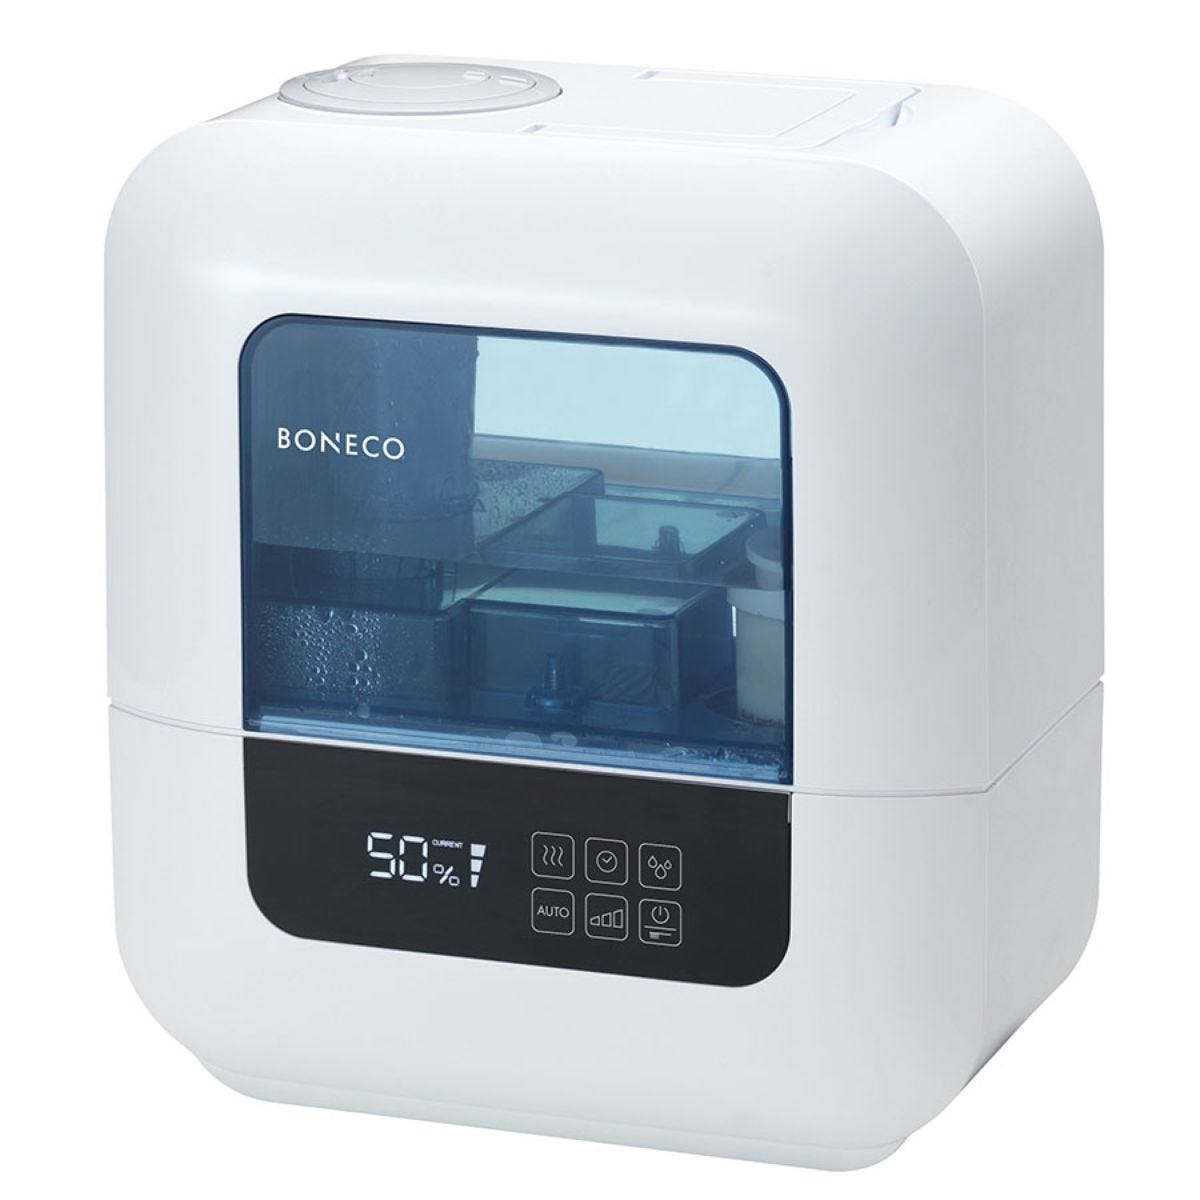 Boneco U300 Cool Mist Ultrasonic Humidifier